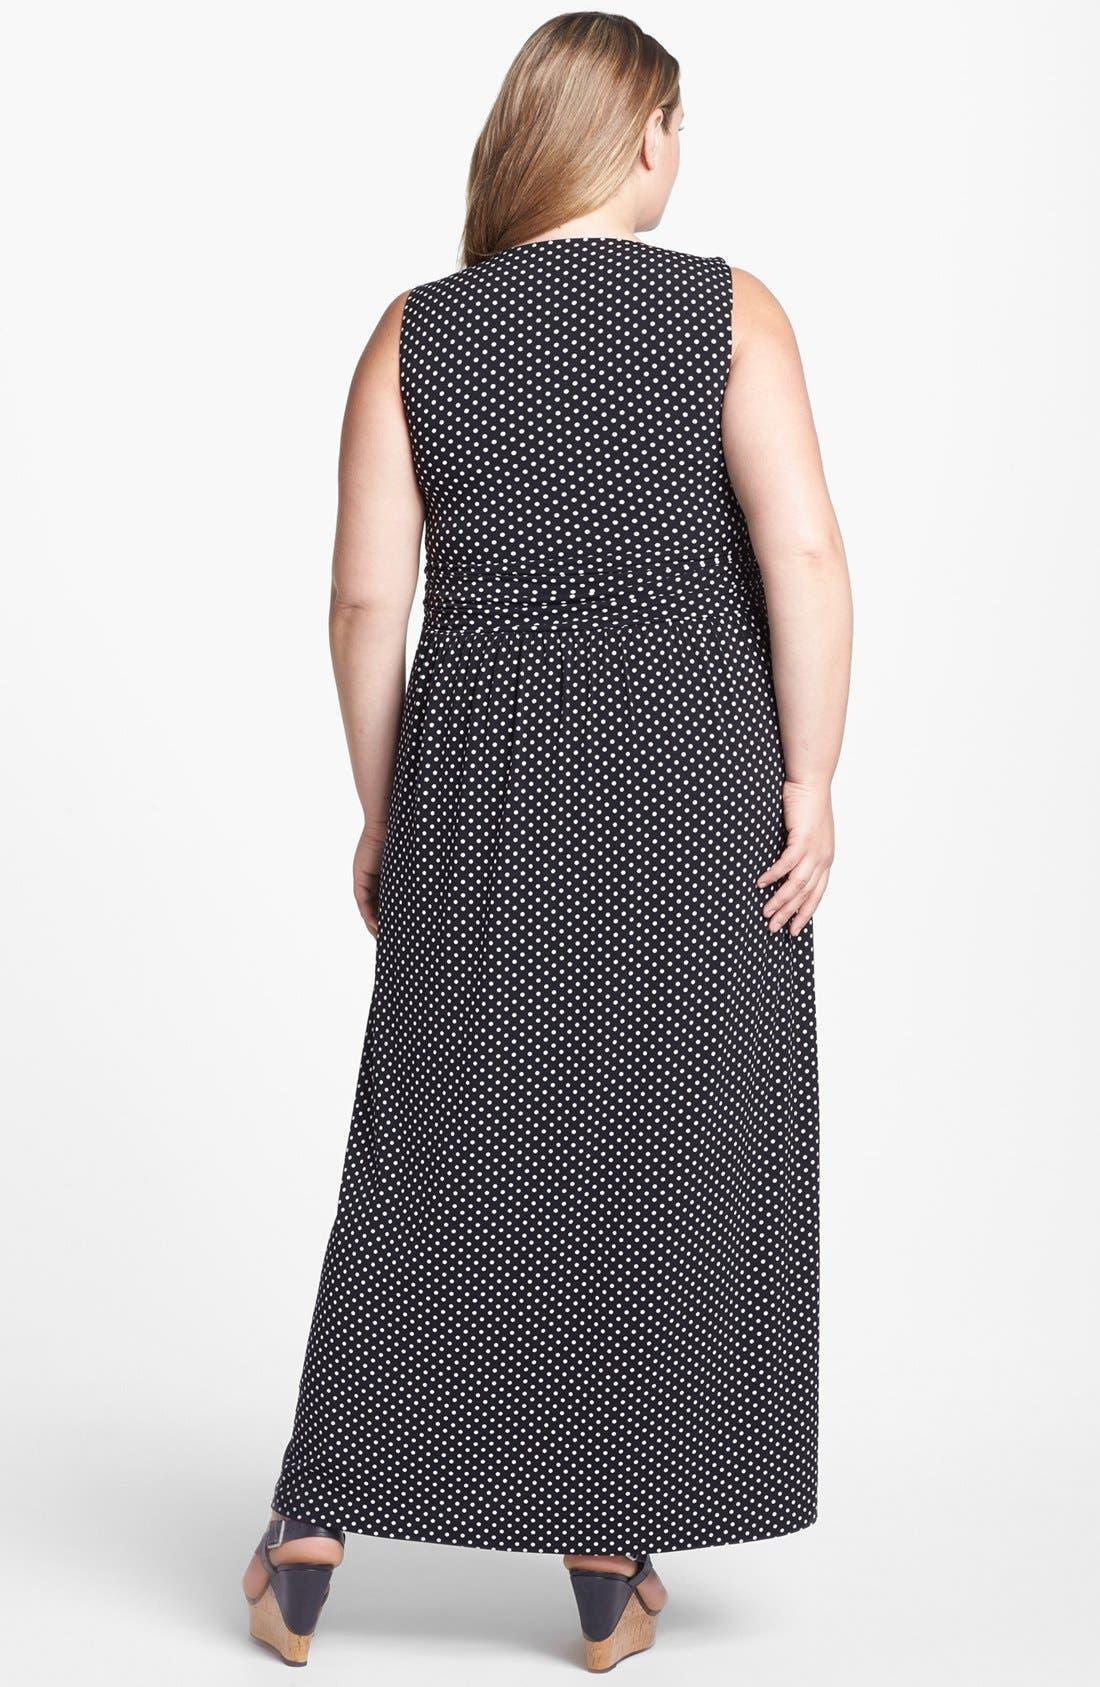 Alternate Image 2  - Vince Camuto Polka Dot Maxi Dress (Plus Size) (Online Only)